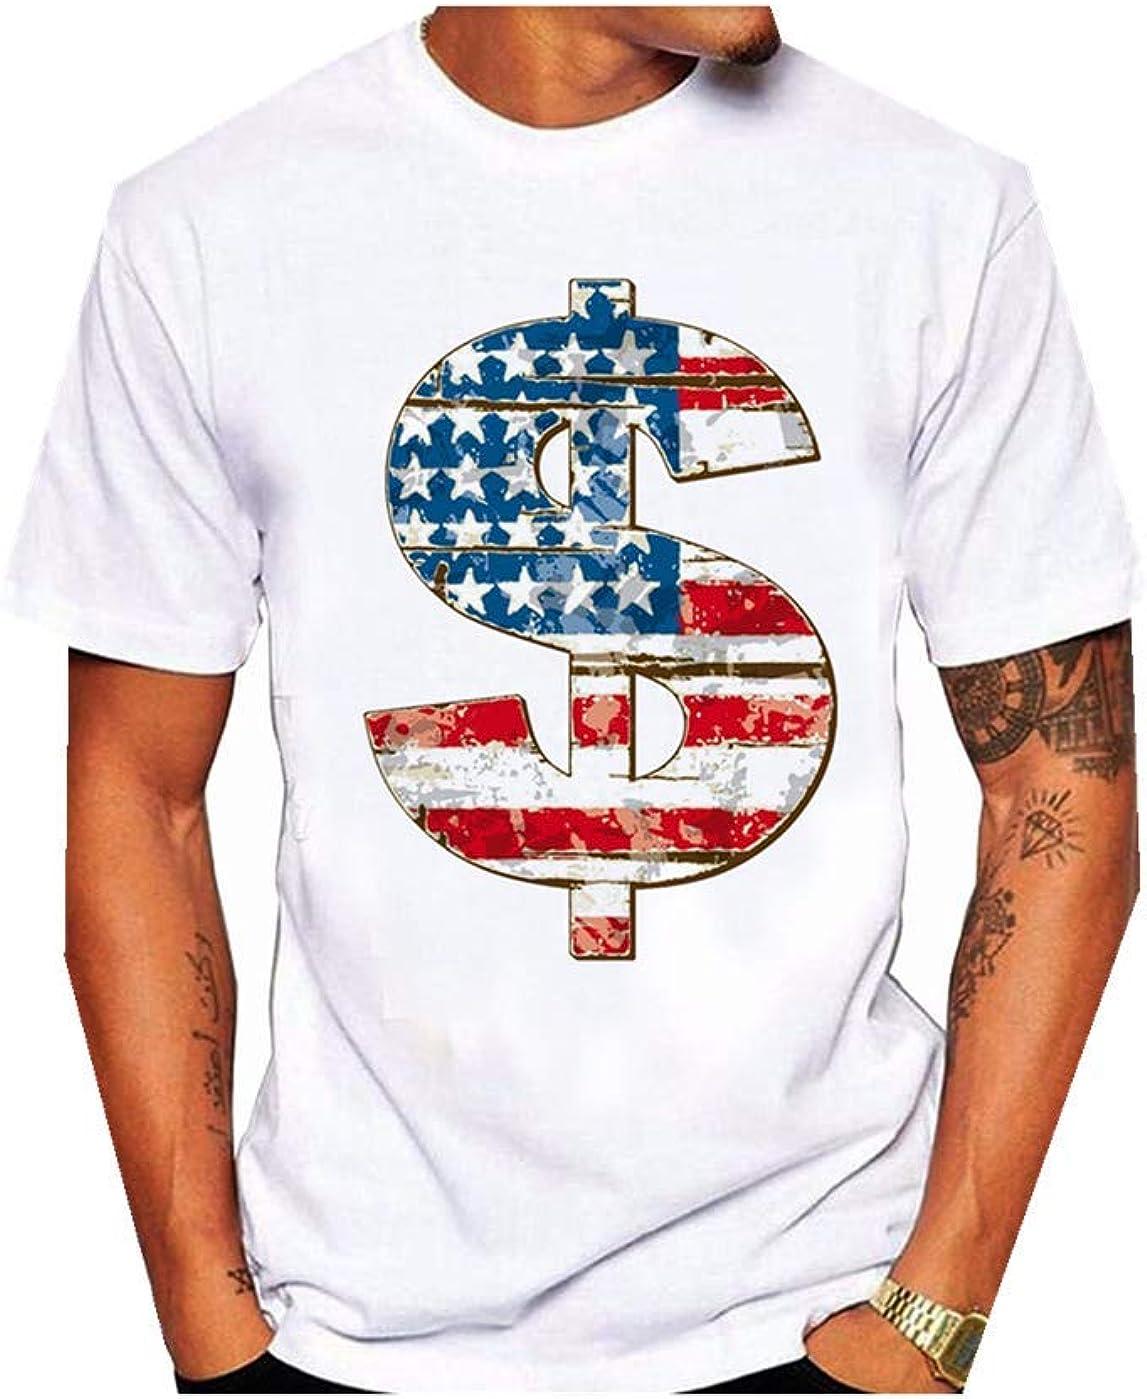 Giulot All Over Print American Flag Military Army Mens T Shirt for Mens T Shirts U.S.A Tee Dollar Best 1776 Shirt Tank